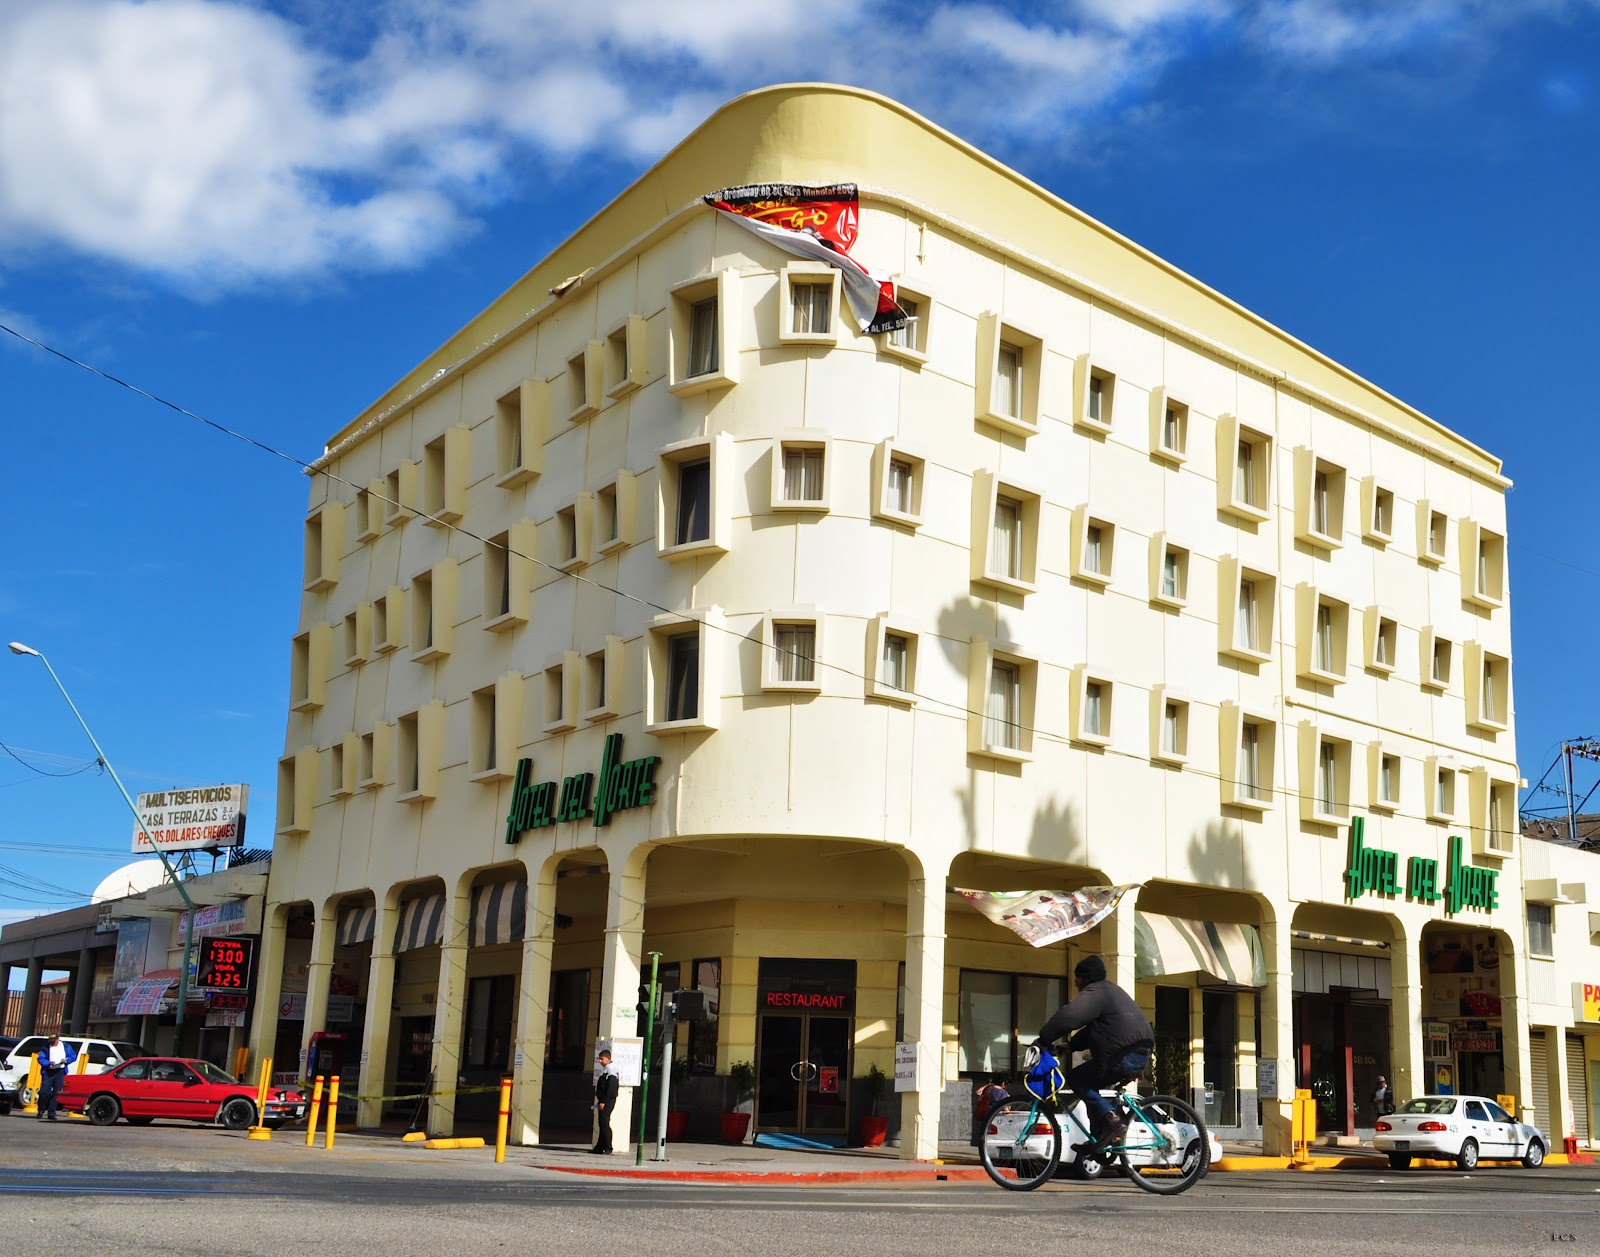 Club Casino Mexicali